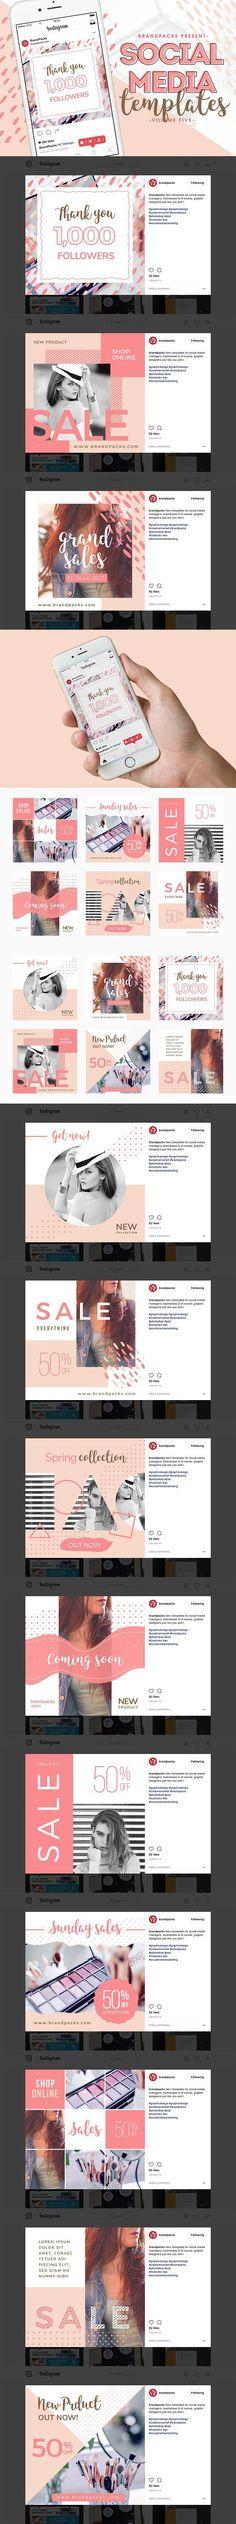 Social Media Templates Pack Vol.5. Social Media Templates